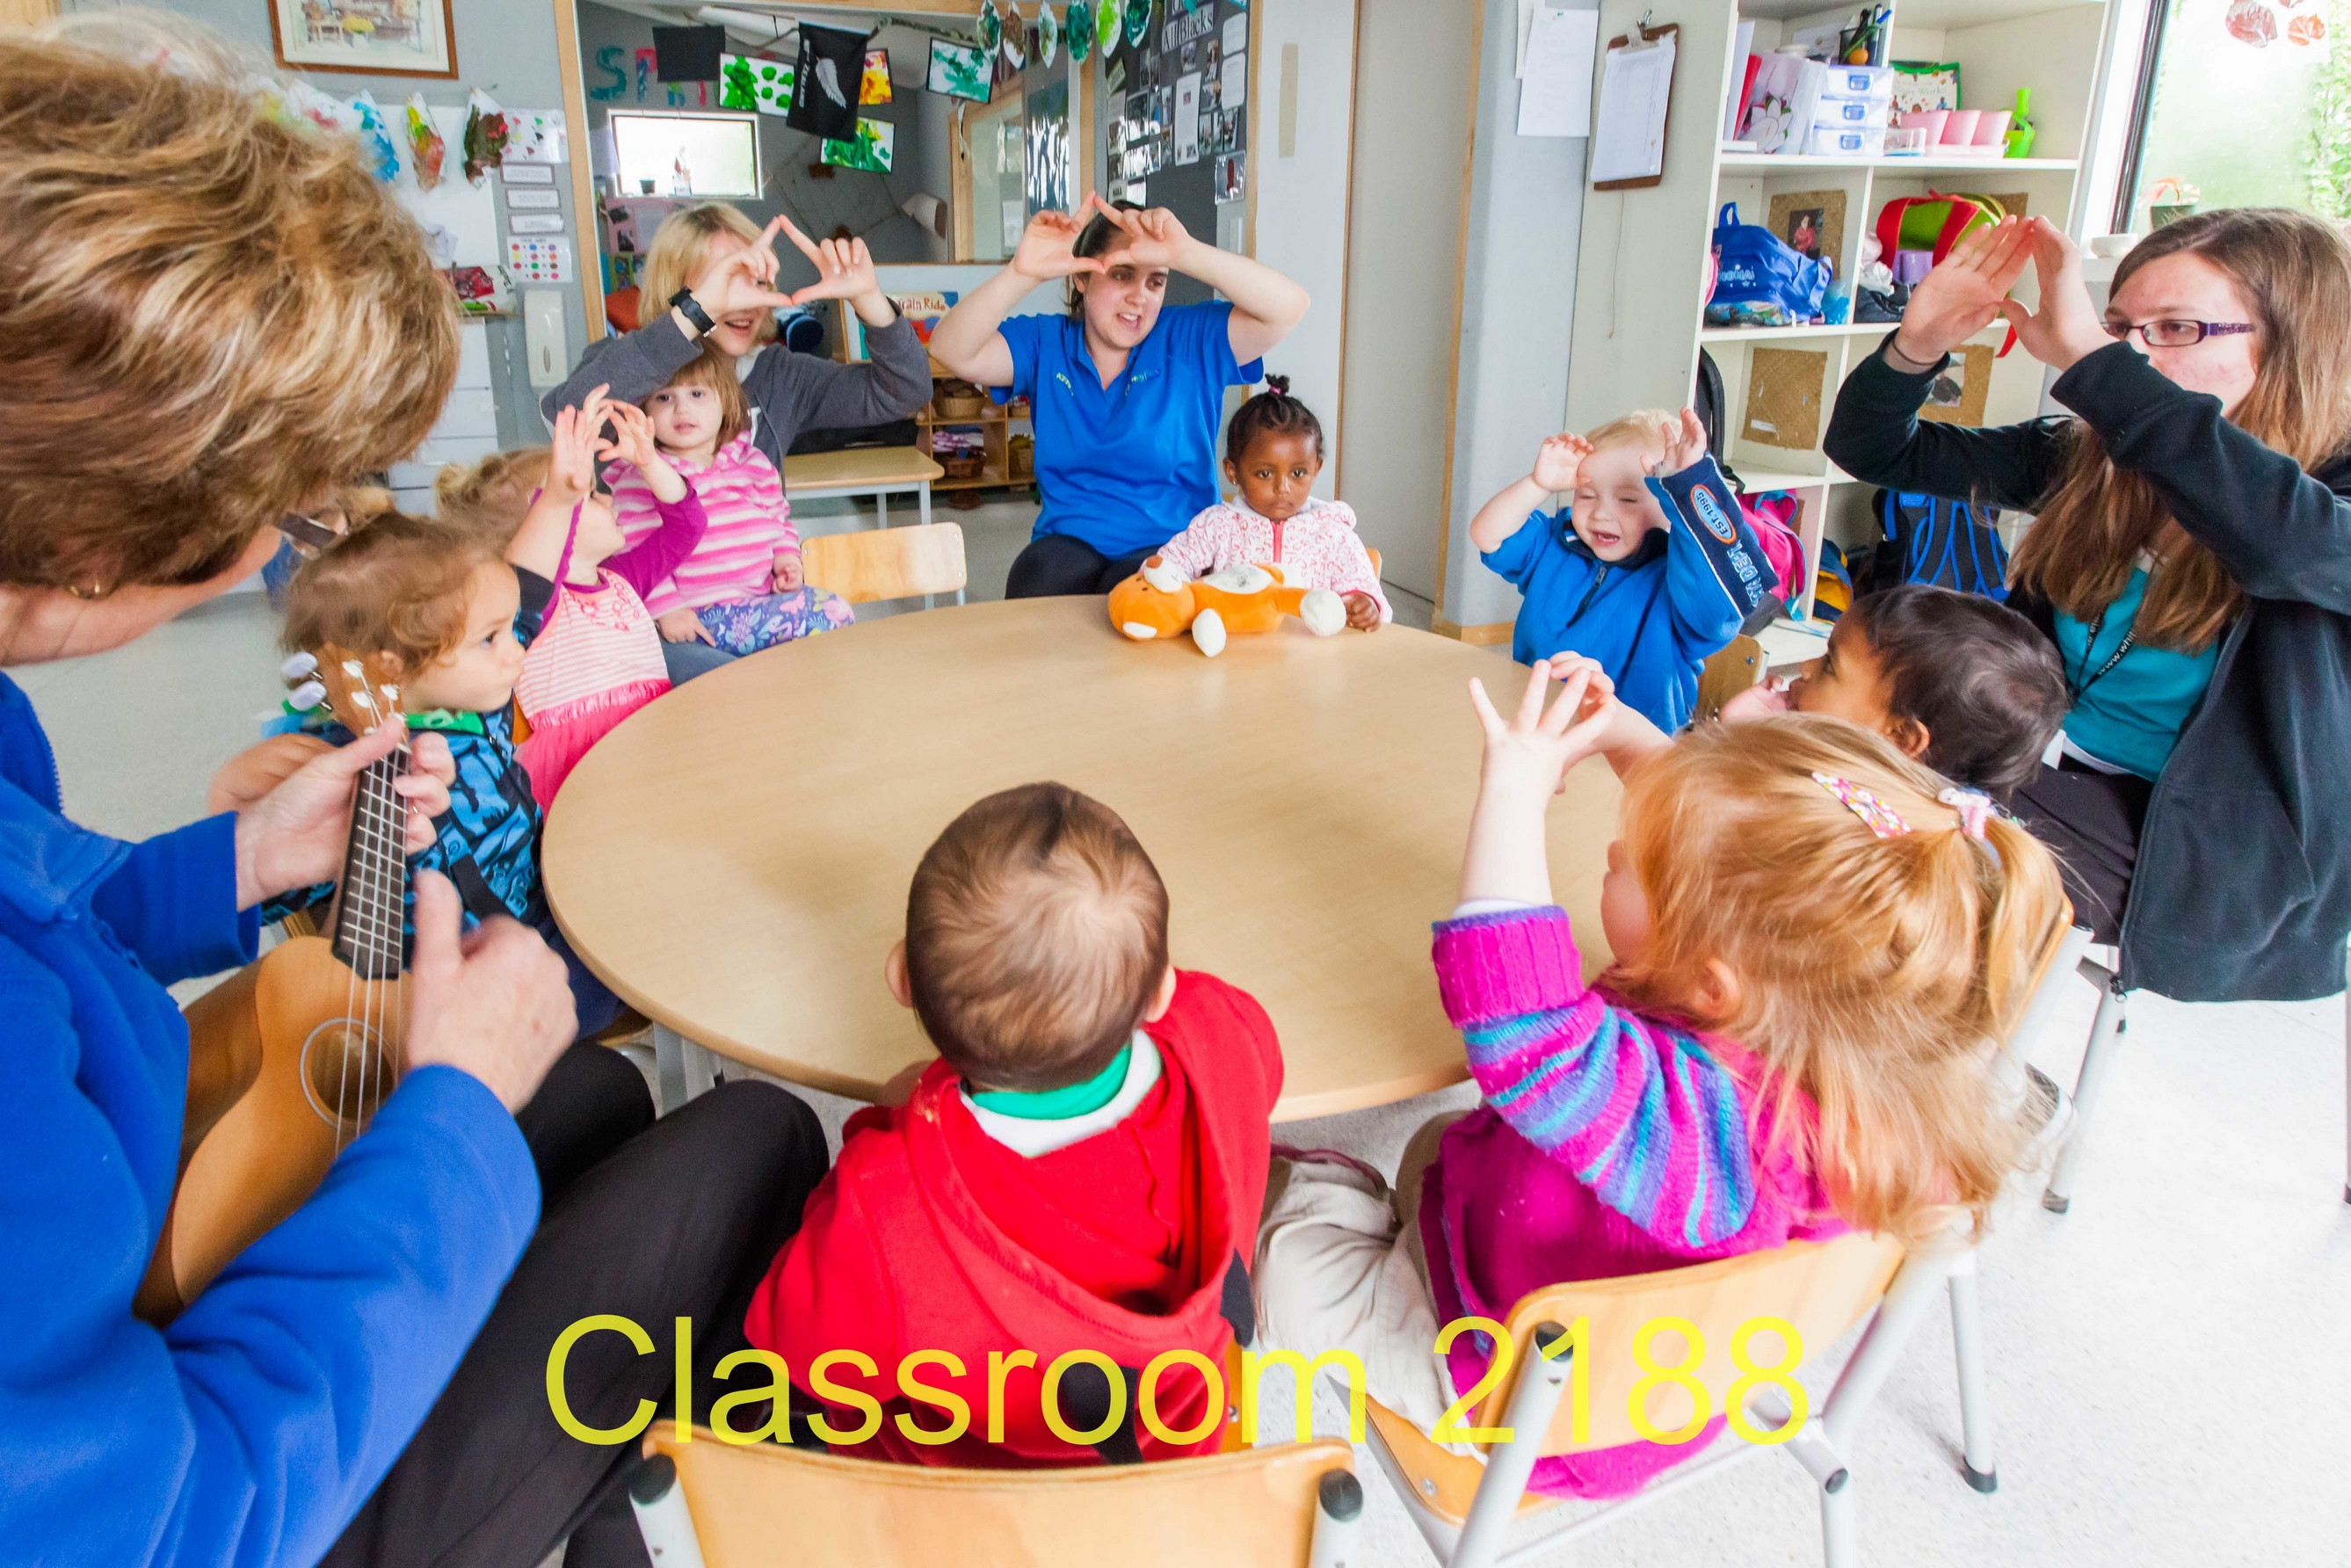 Classroom 2188